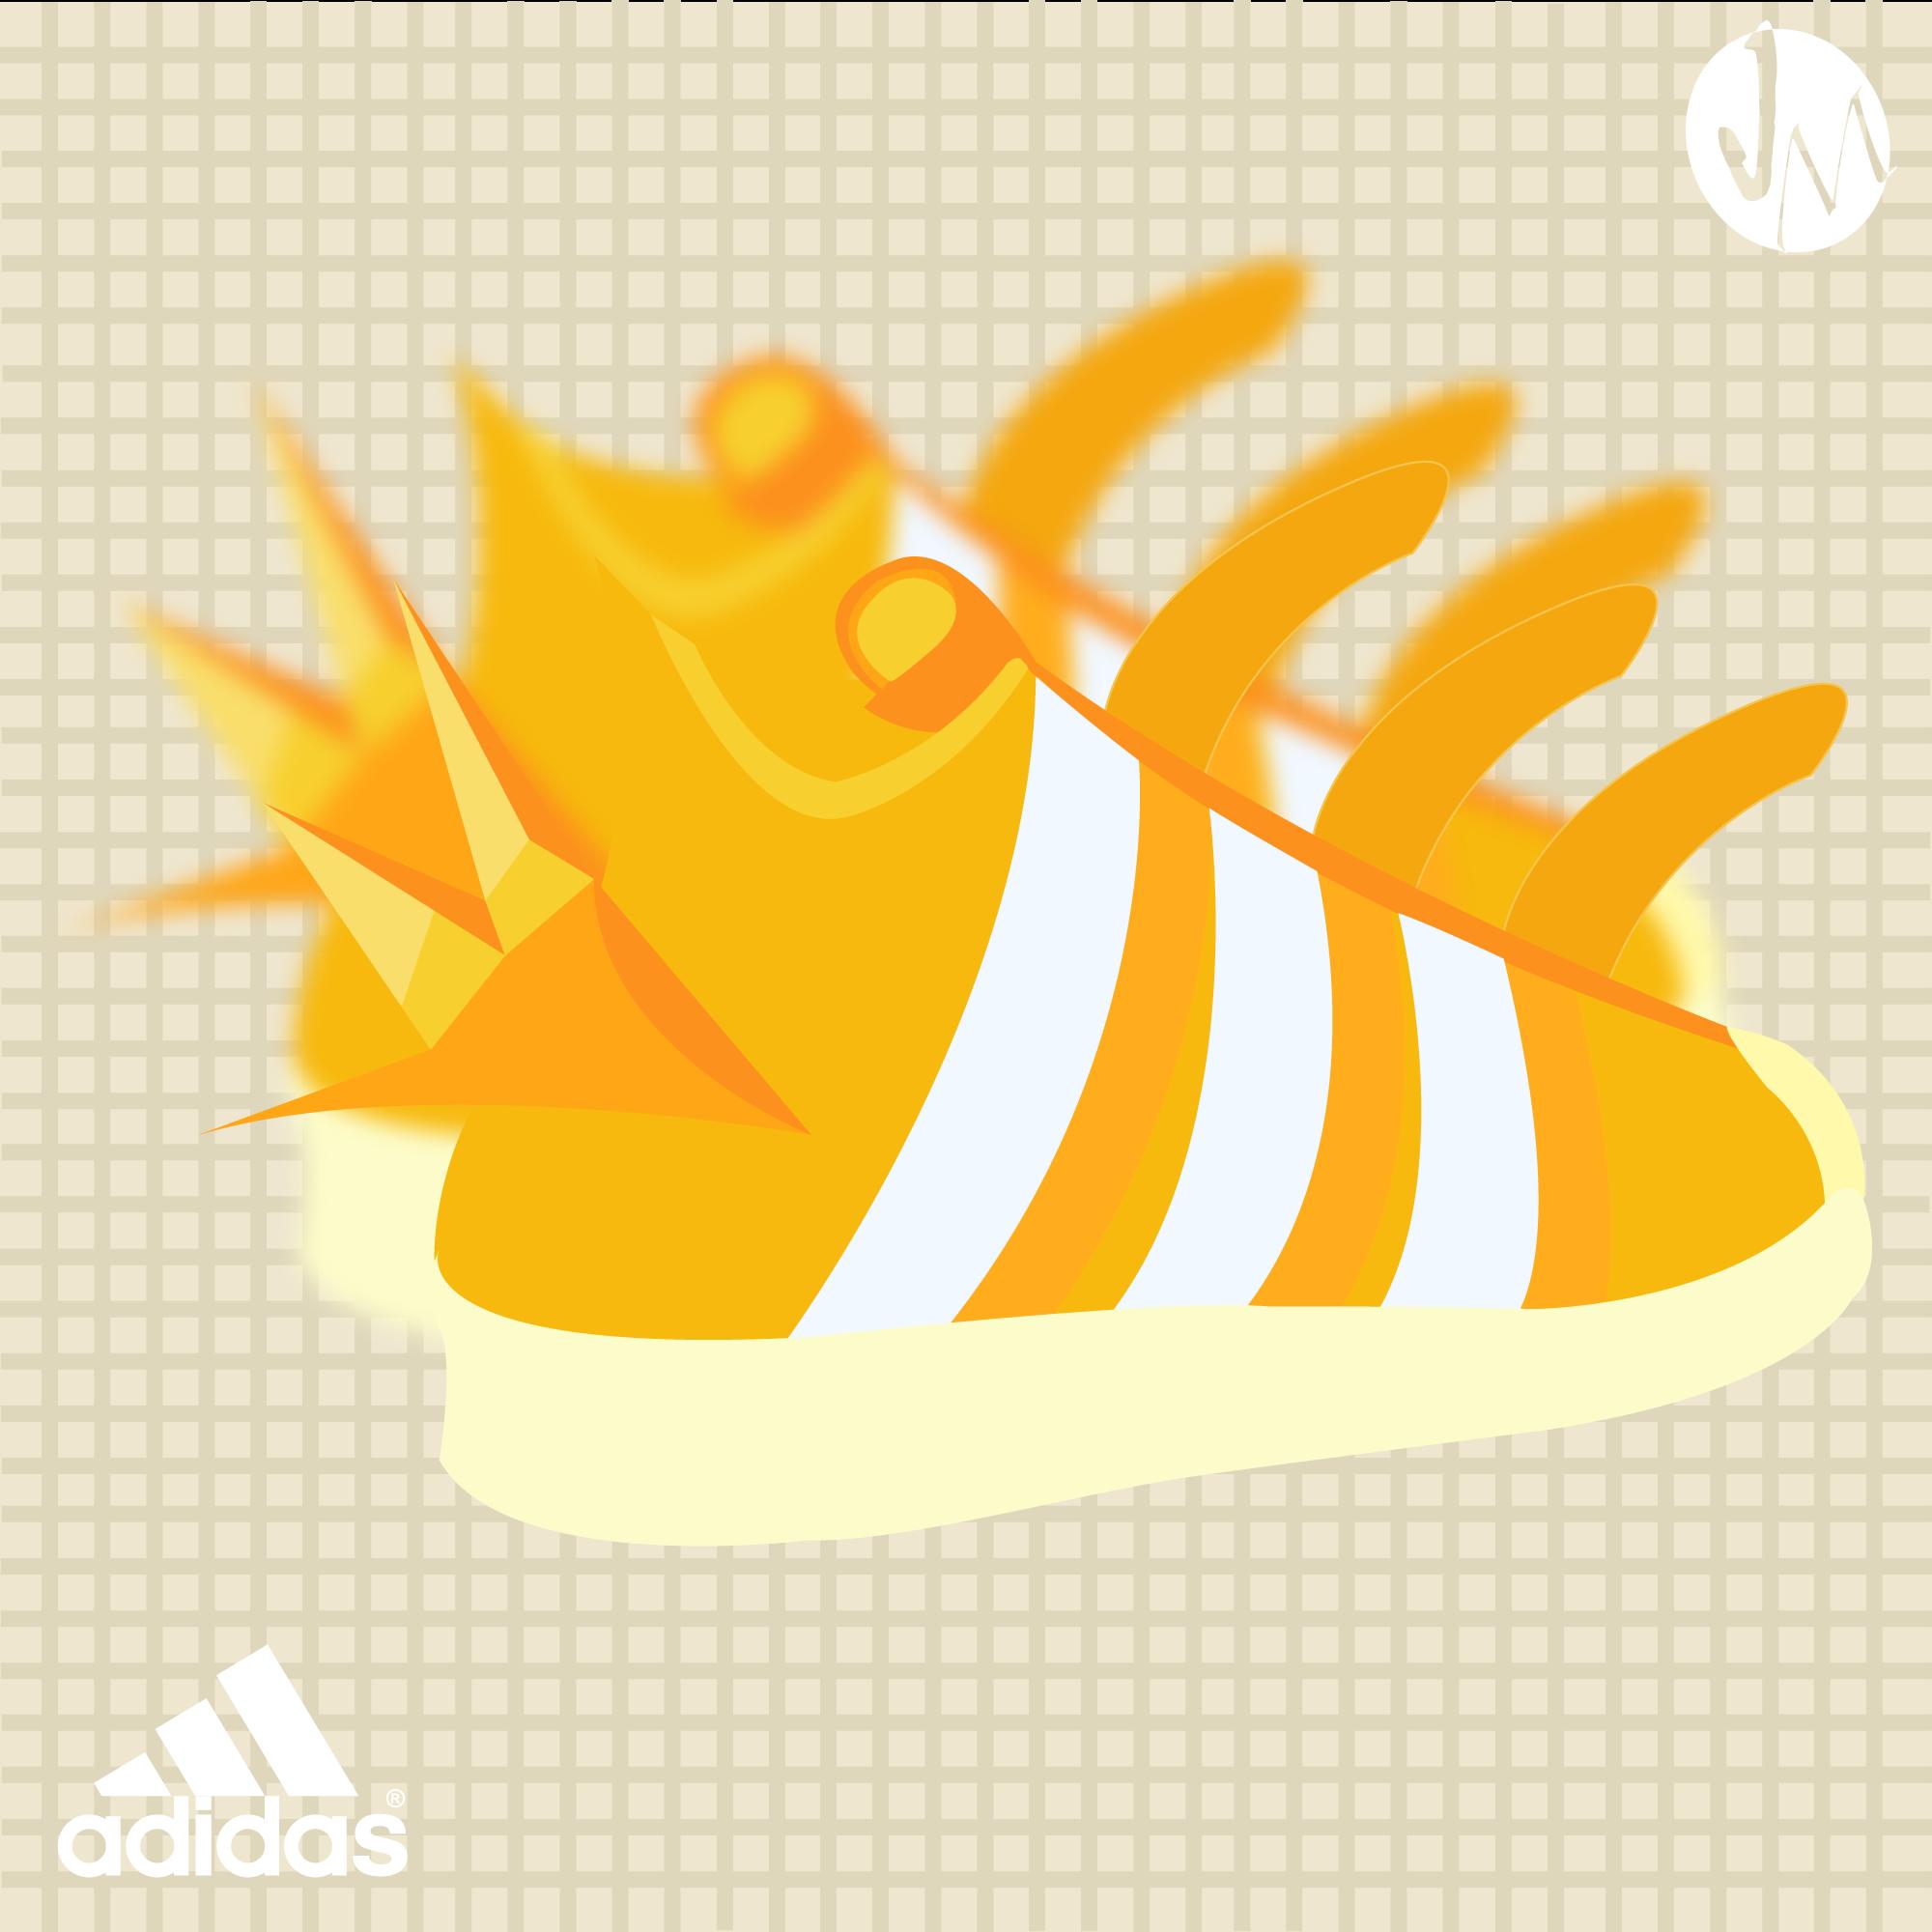 Adidas-Sunburst-High1.png